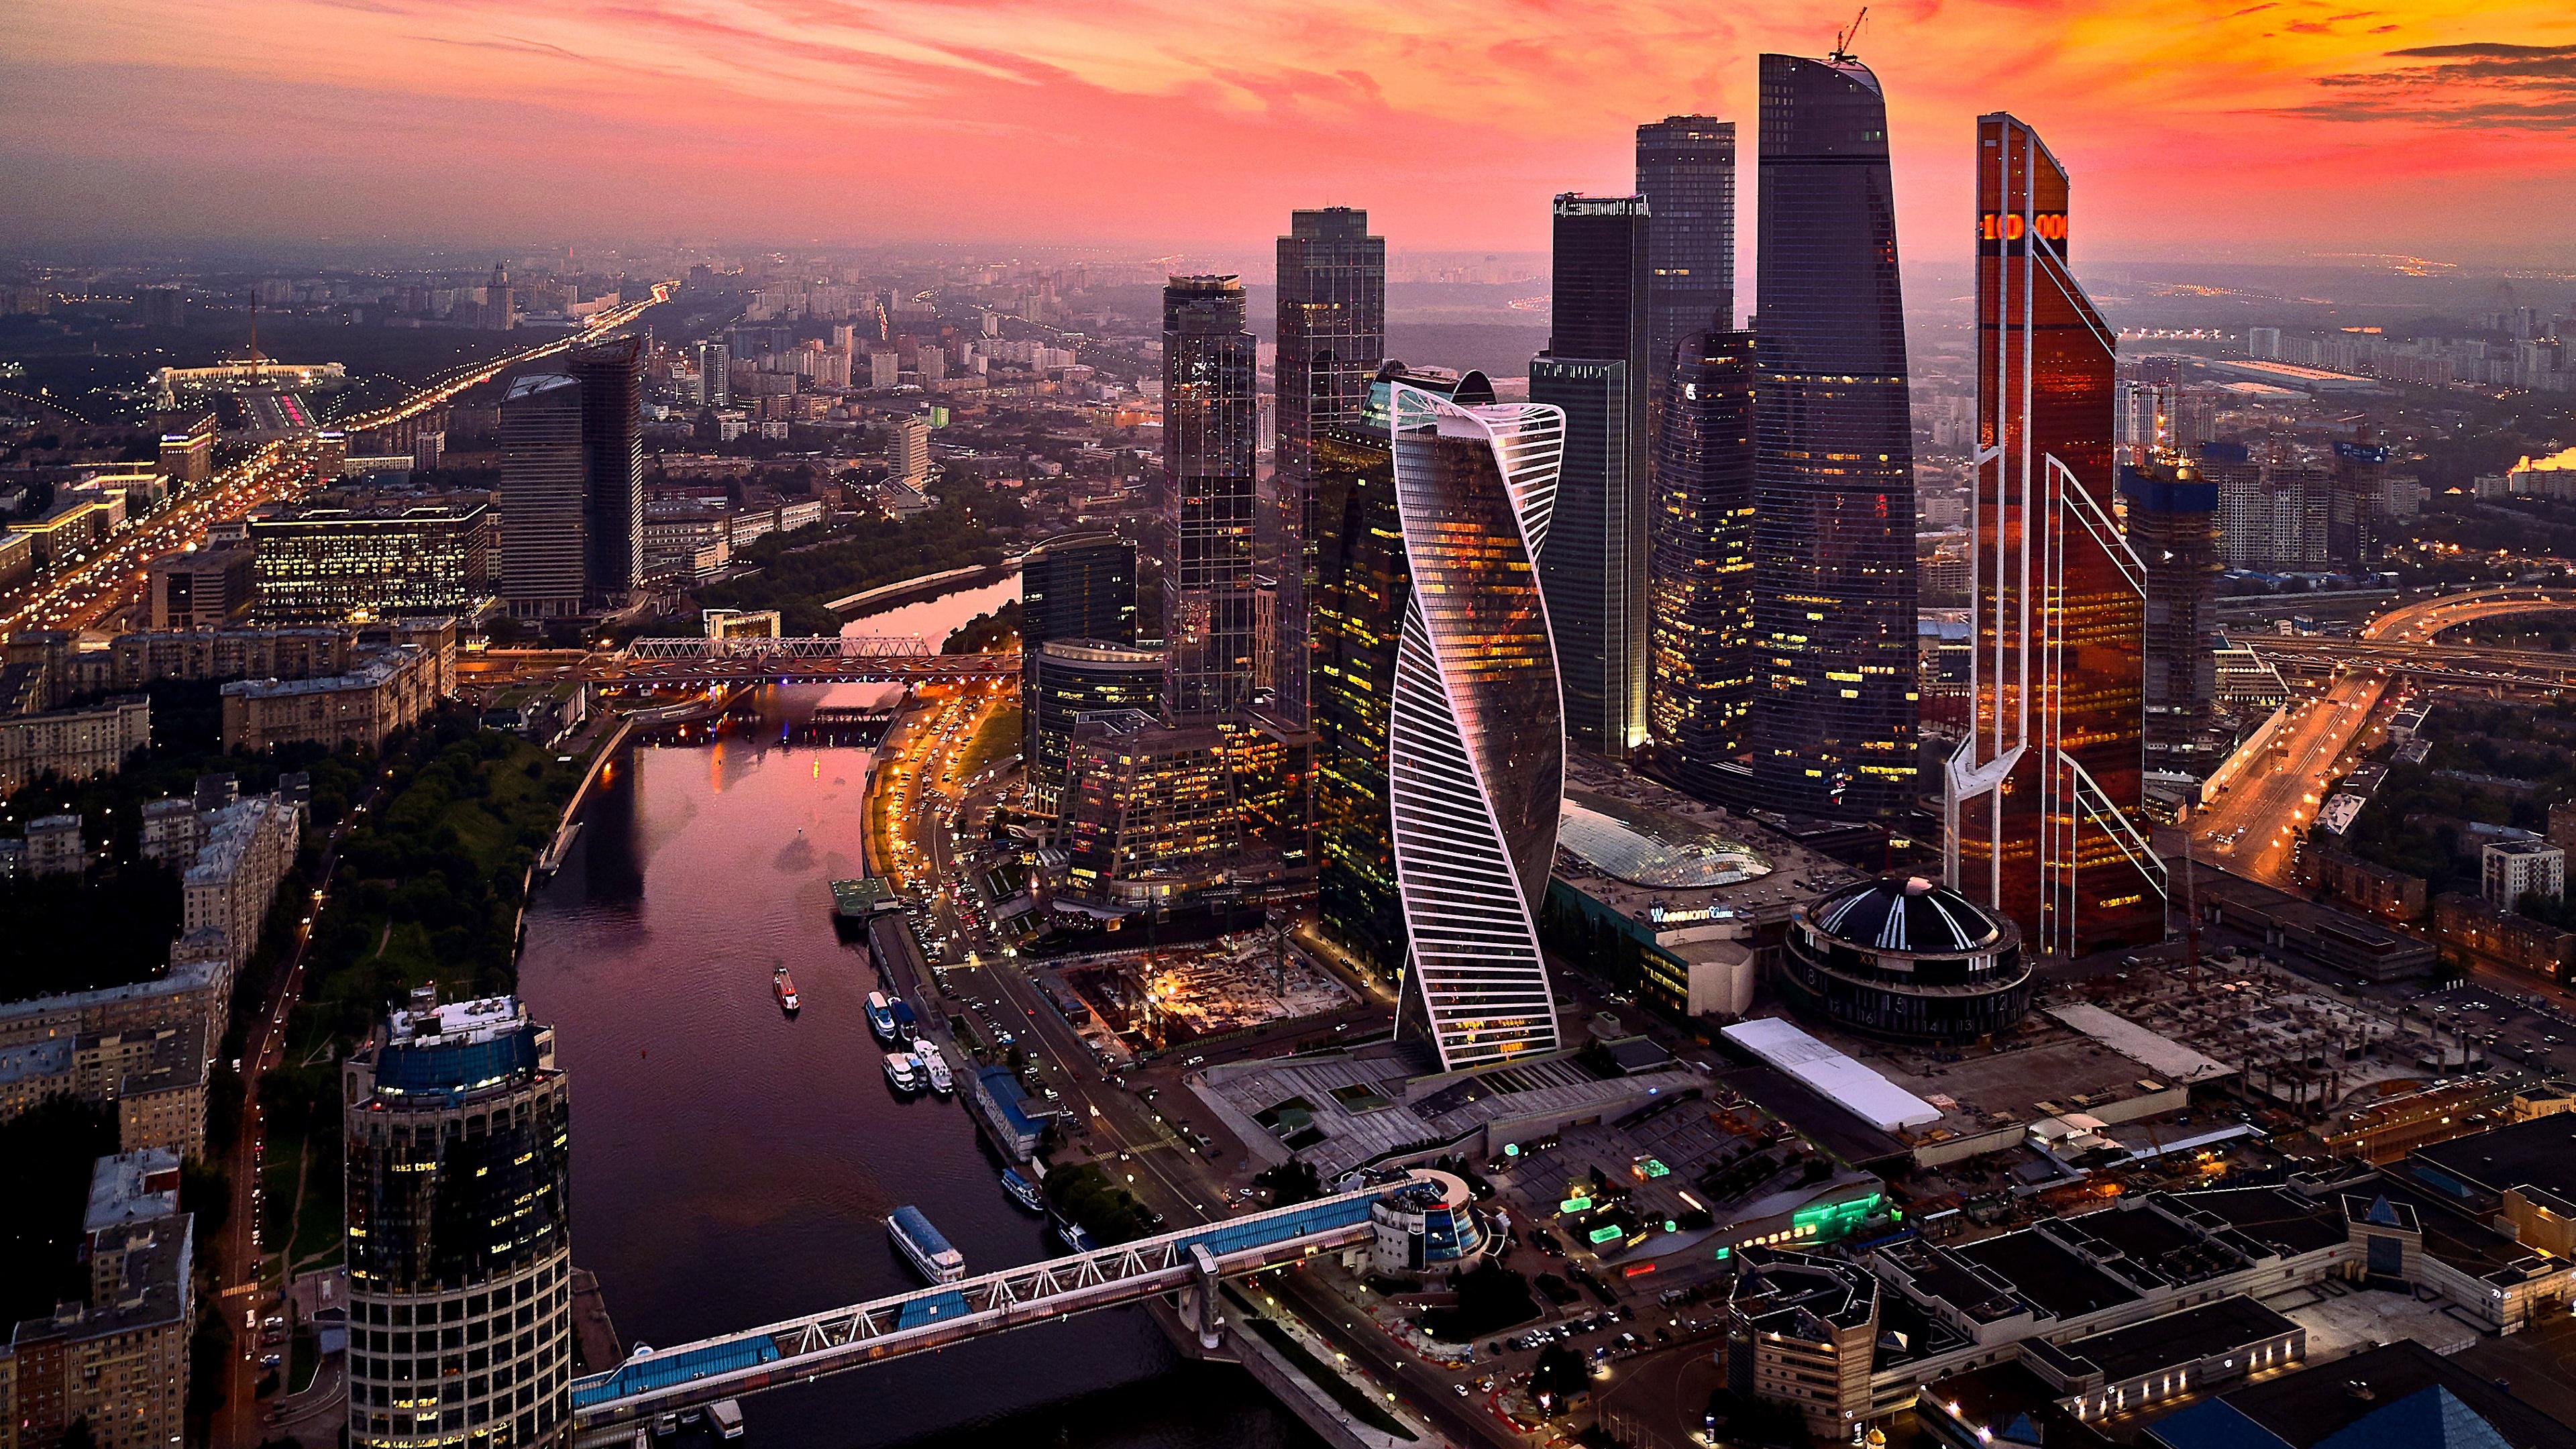 Moscow international business center russia 4k ultrahd wallpaper backiee free ultra hd - 4k wallpaper russia ...